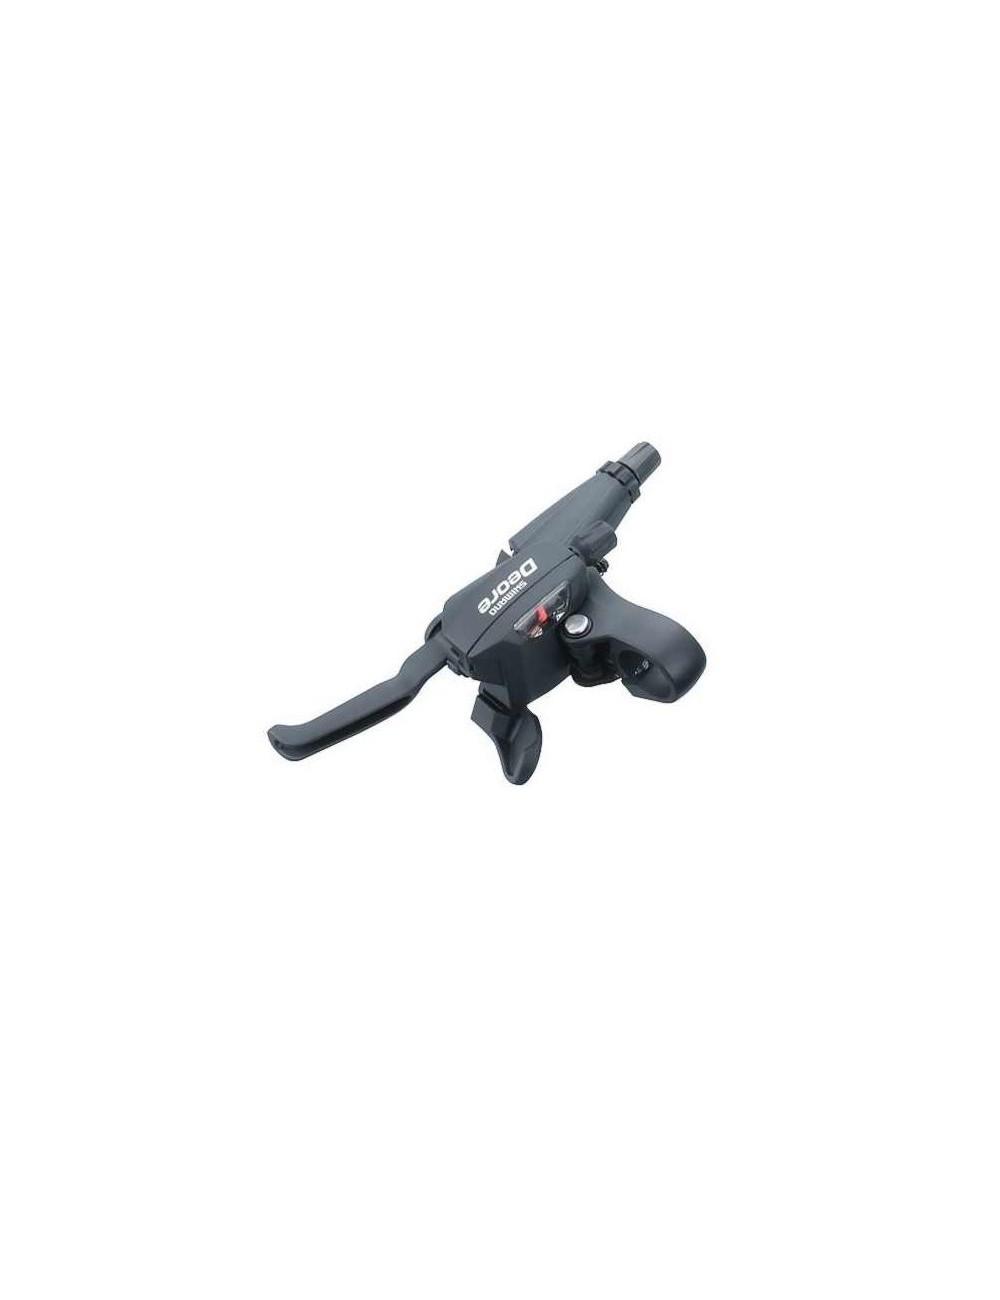 MANETE ESQ. DUAL CONTROL DEORE-BRAKE KSTM530LBL